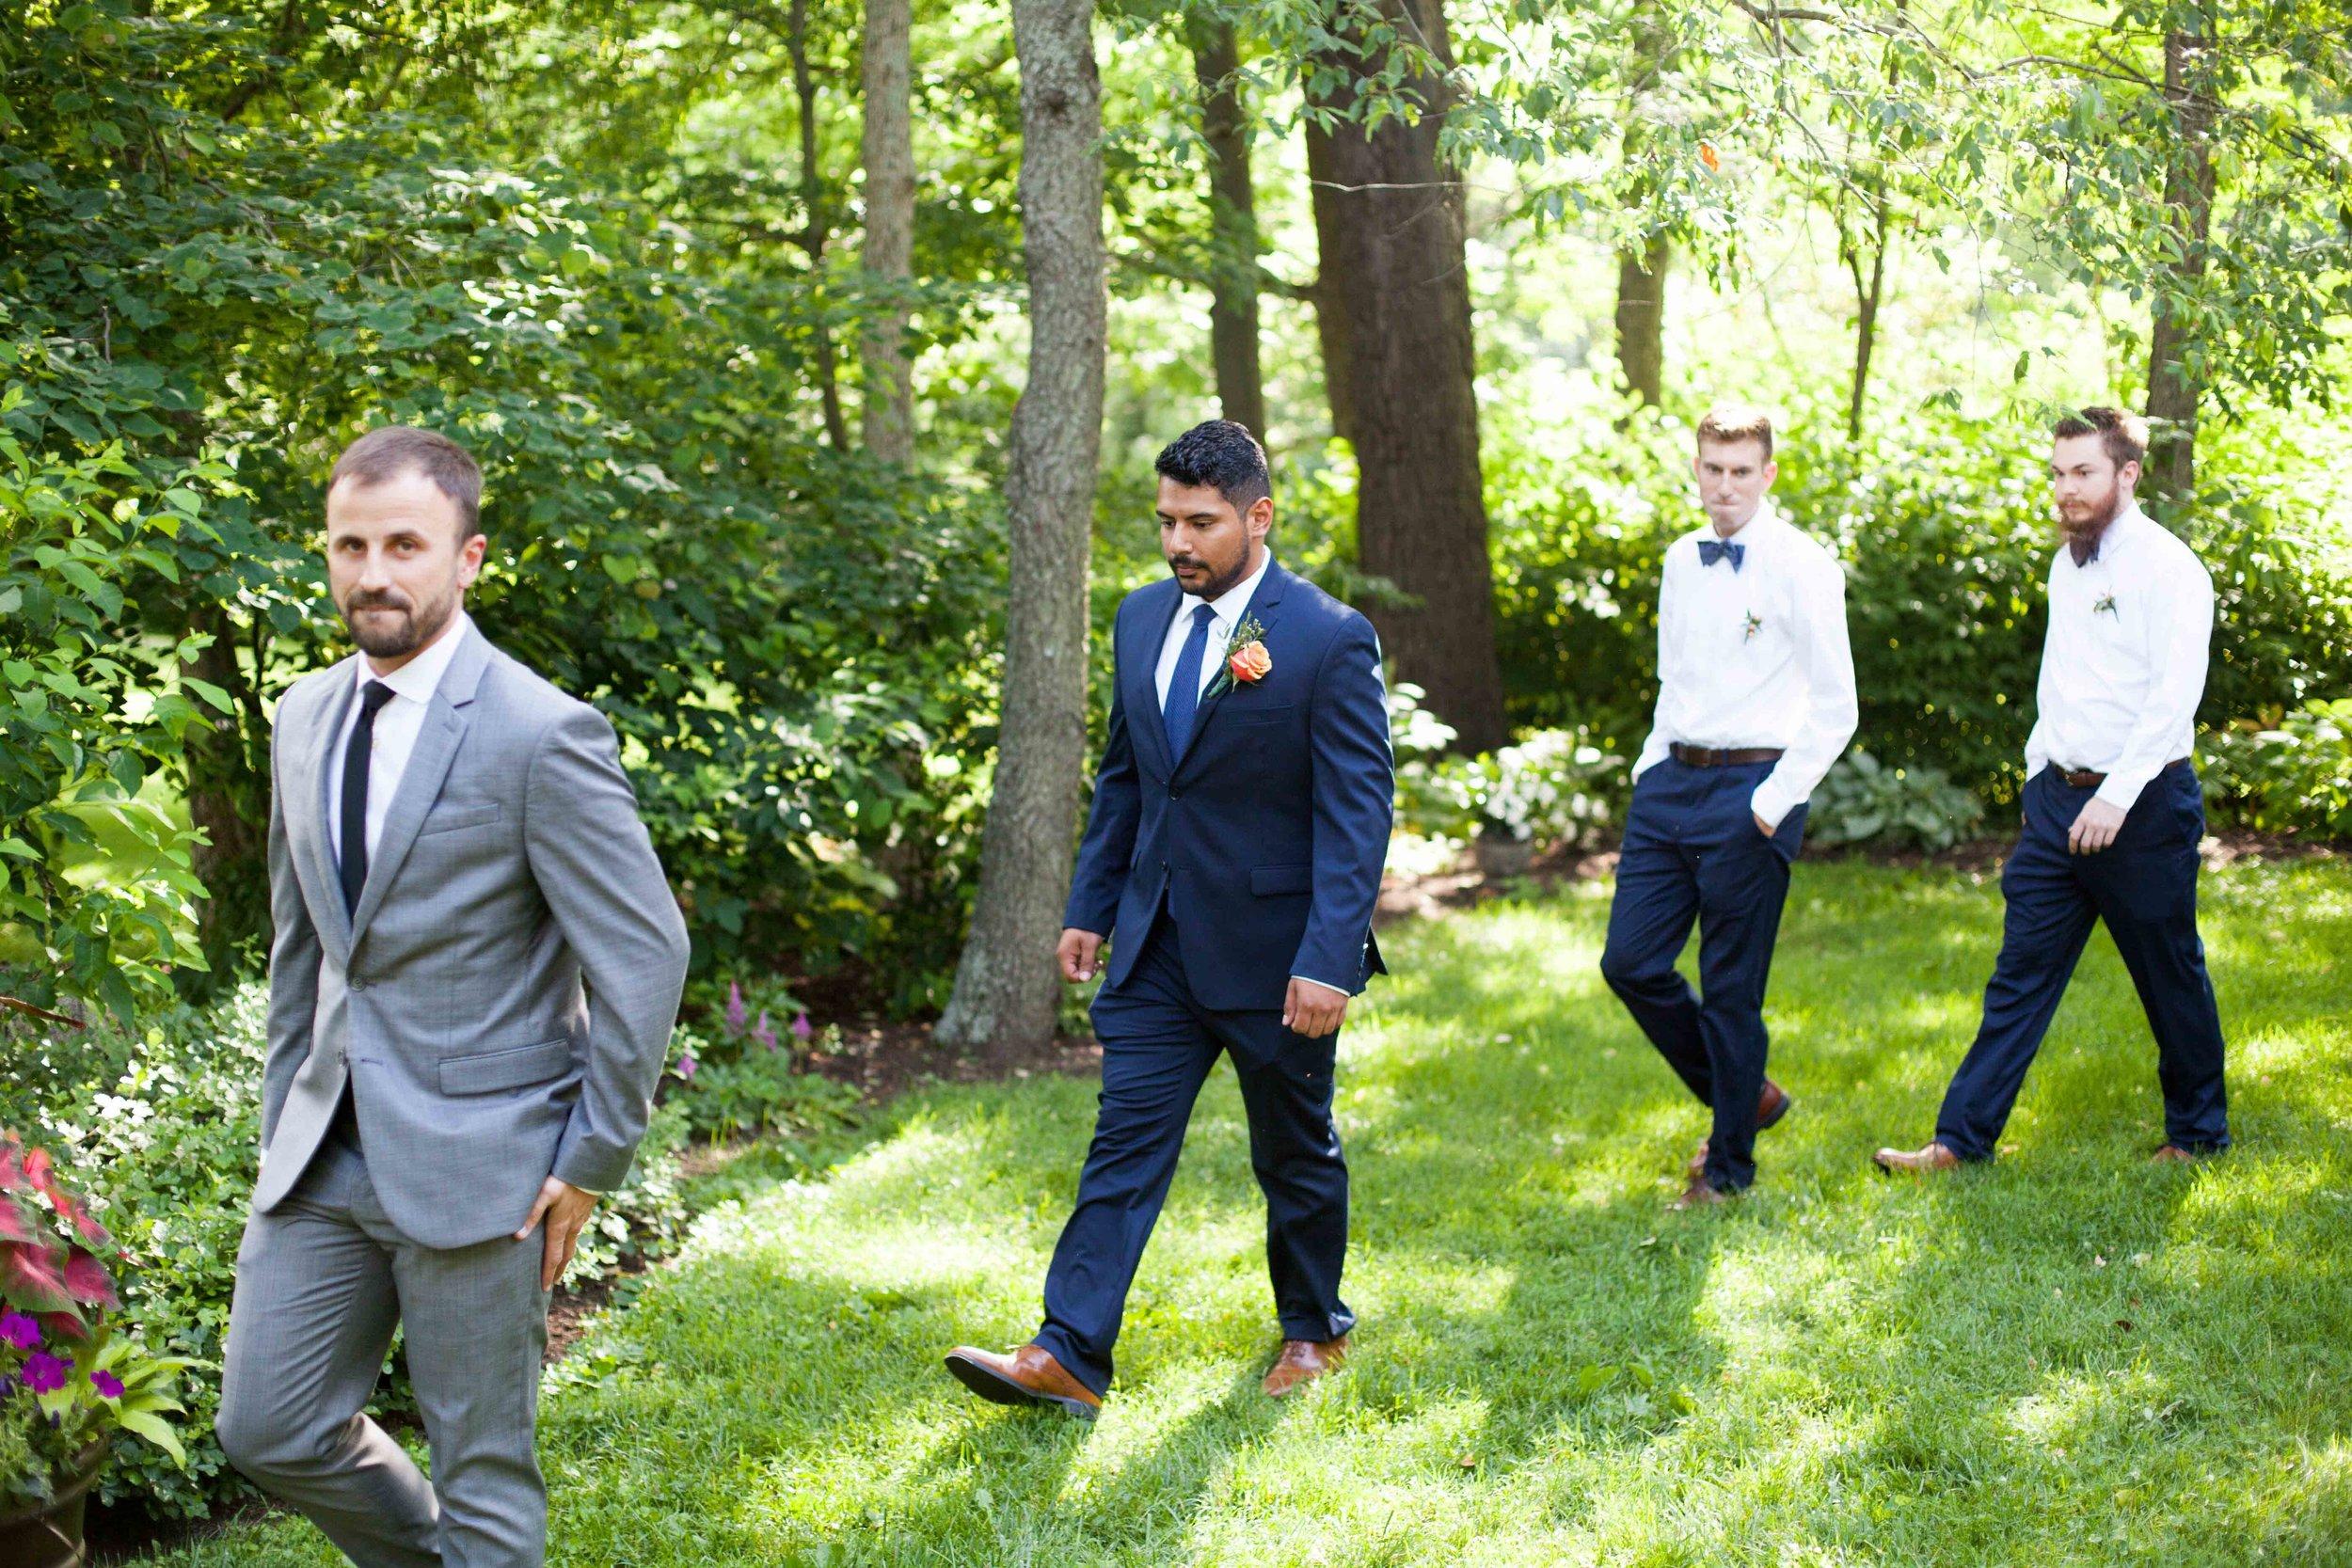 dd cincinnati wedding photographer ceremony0003.jpg